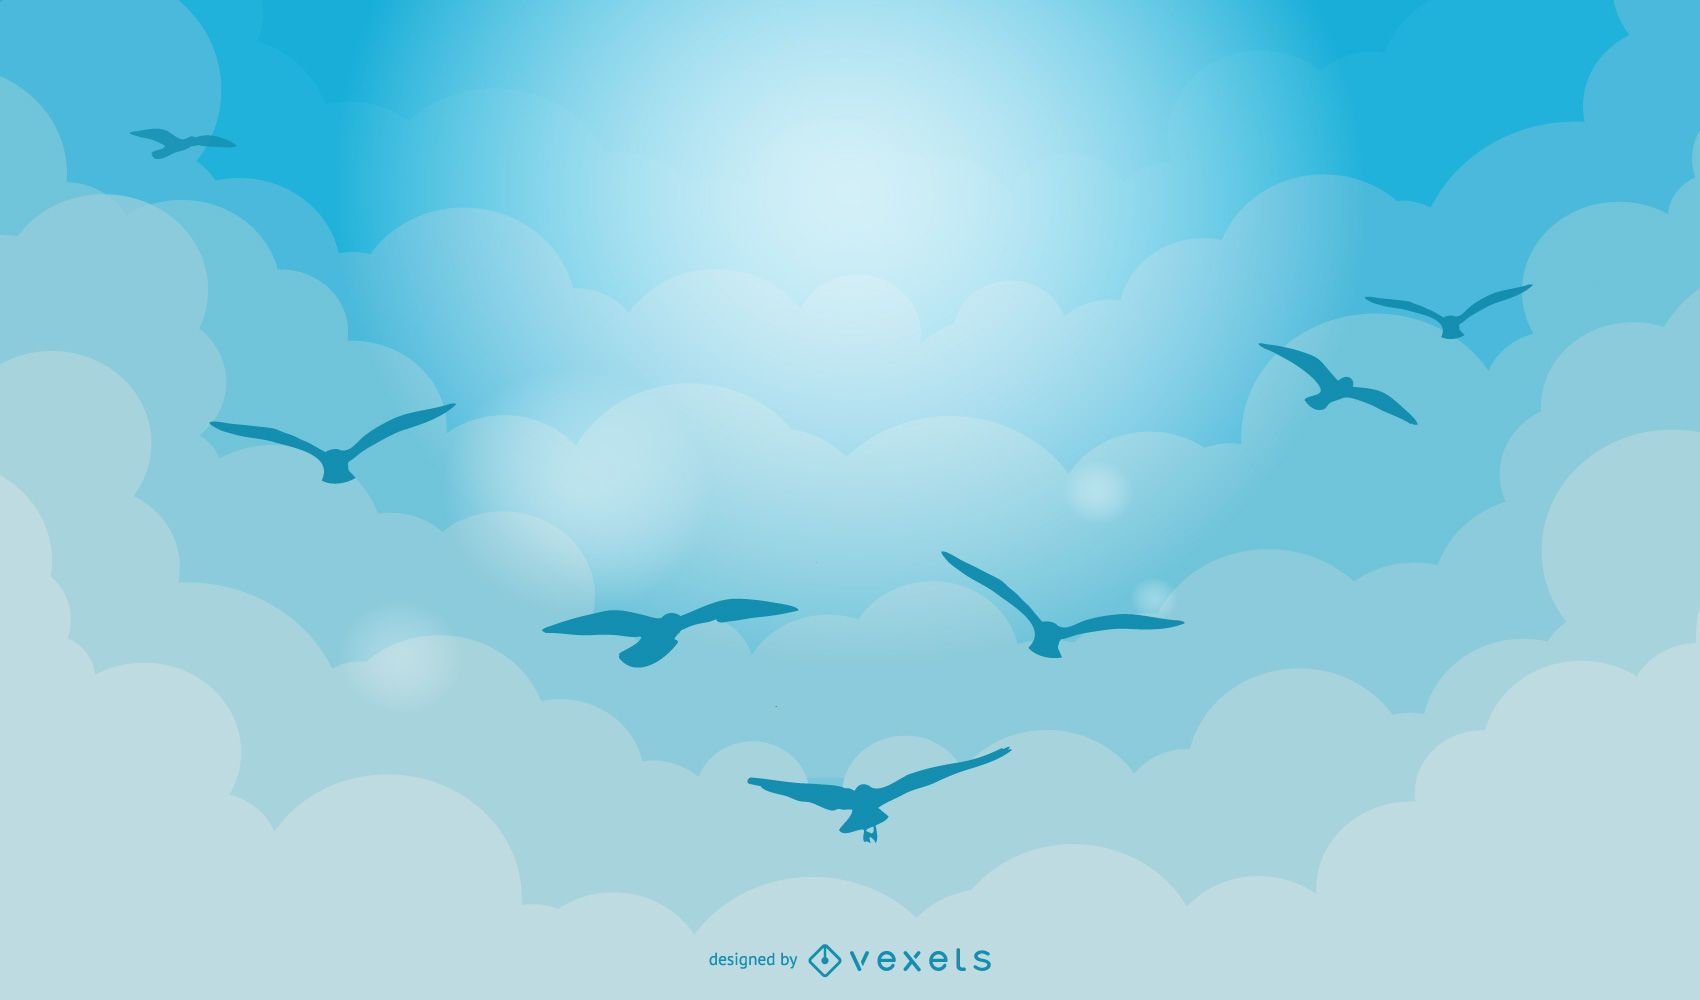 Blue Sky Bird Flock Graphic